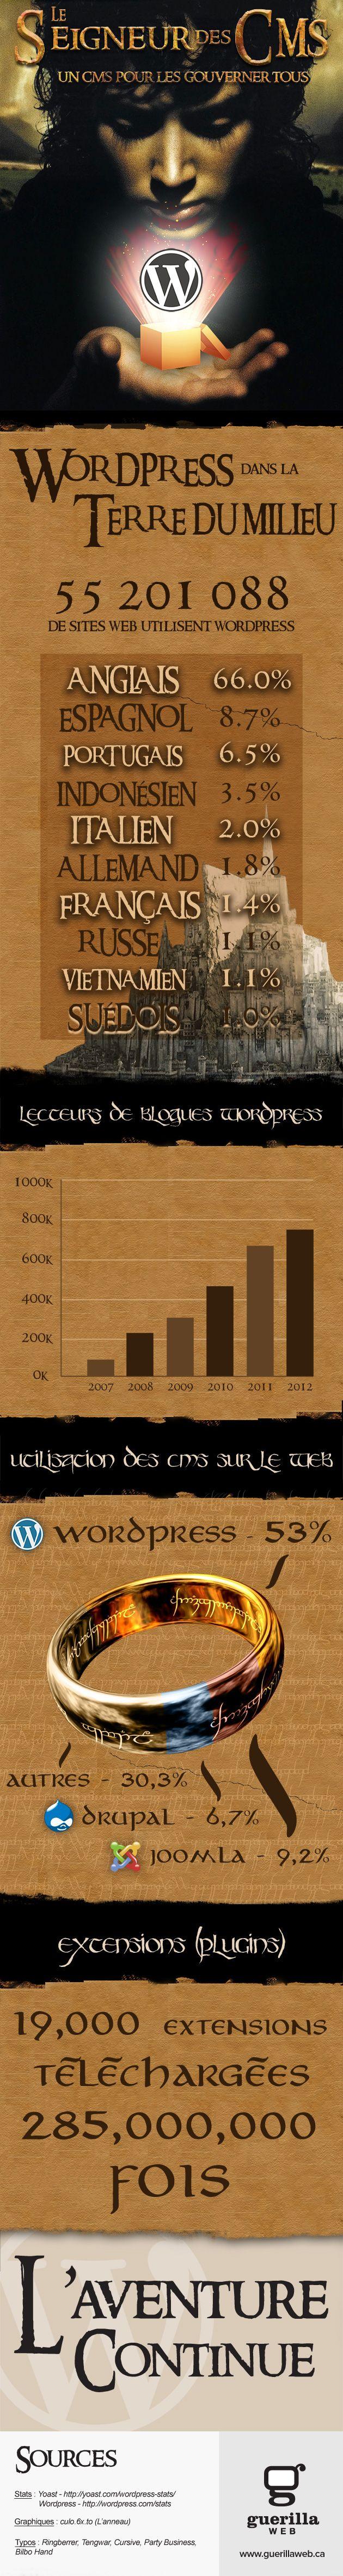 [infographie] Utilisation du CMS Wordpress